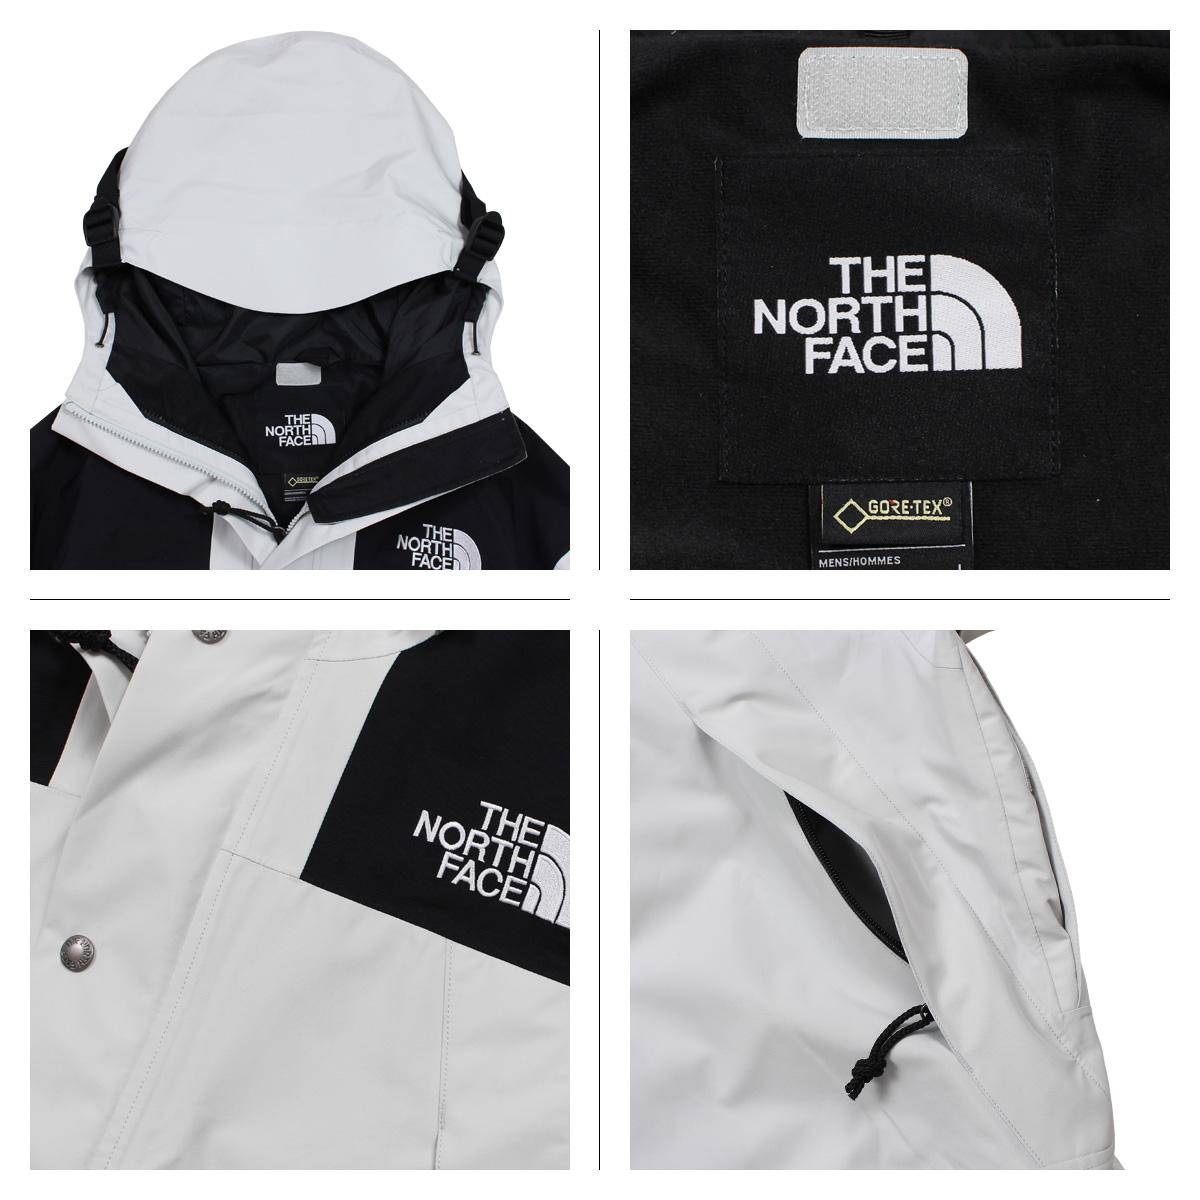 THE NORTH FACE MENS 1990 MOUNTAIN JACKET GTX ノースフェイス ジャケット マウンテンパーカー メンズ ゴアテックス グレー NF0A3XCO9B8OiZTkuXP